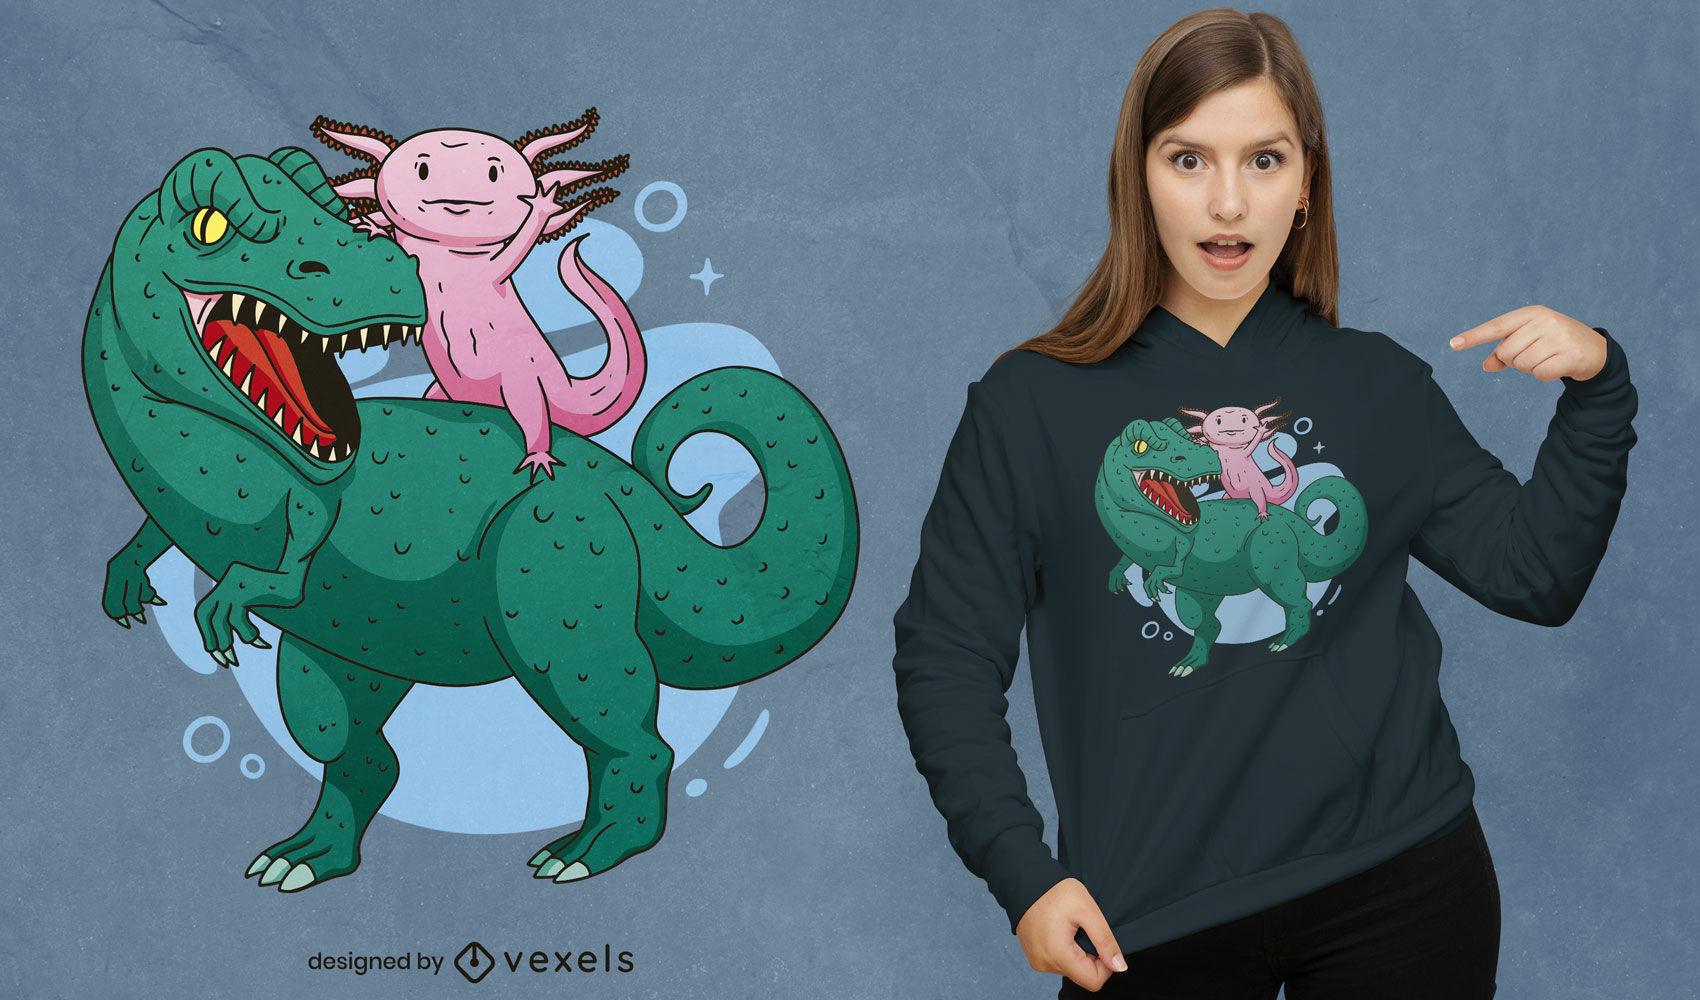 Cooles Axolotl und T-Rex T-Shirt Design